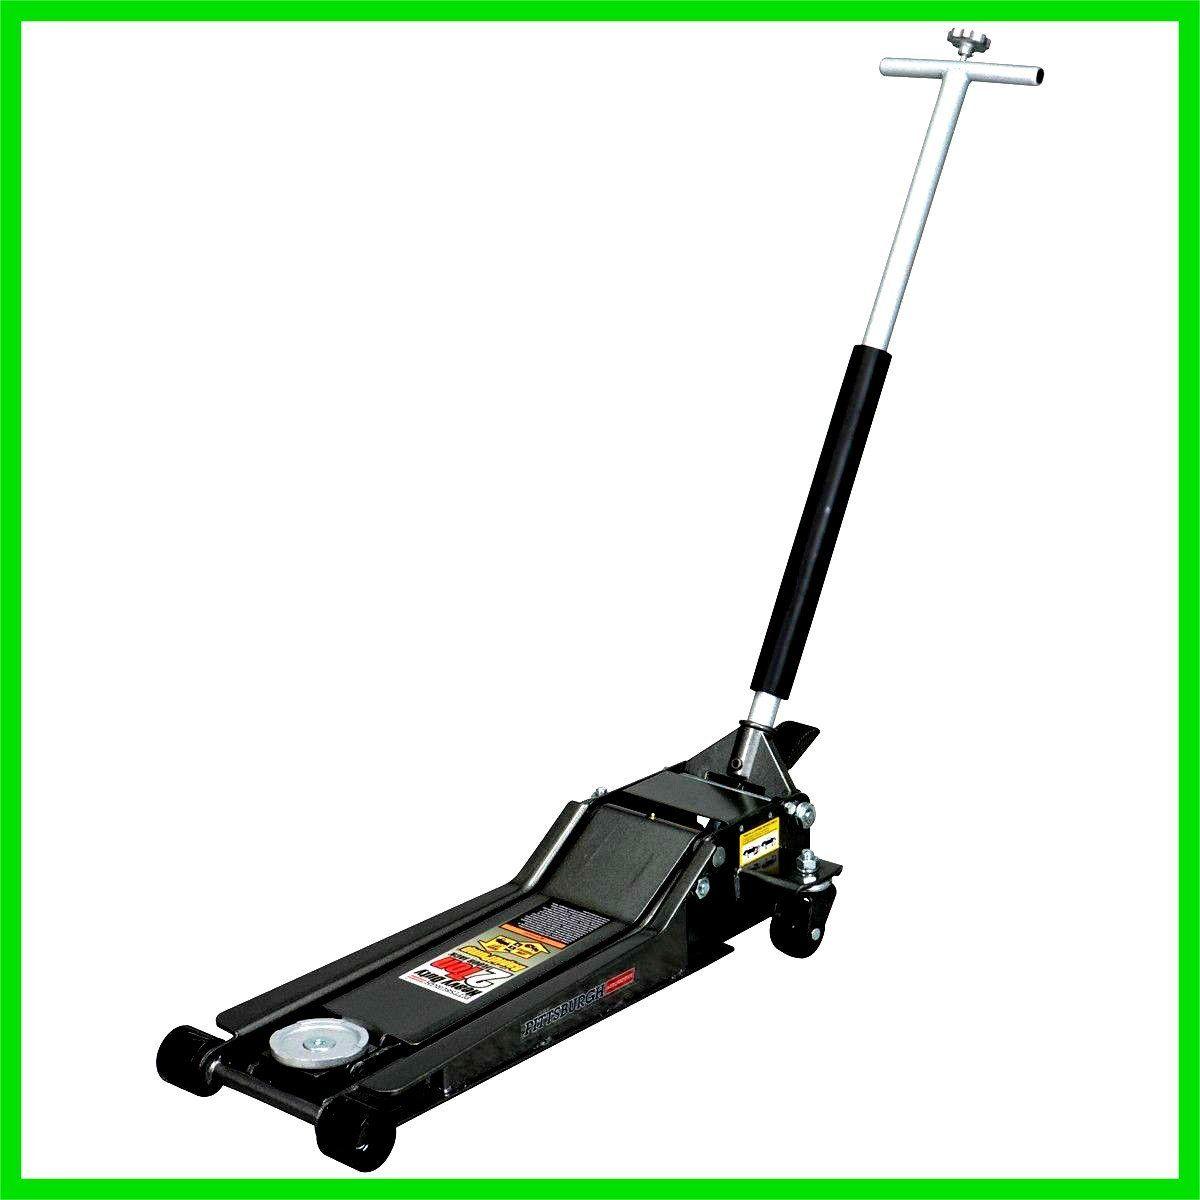 Floor Jack Stand Lifter Low Profile Heavy Duty 2 Ton